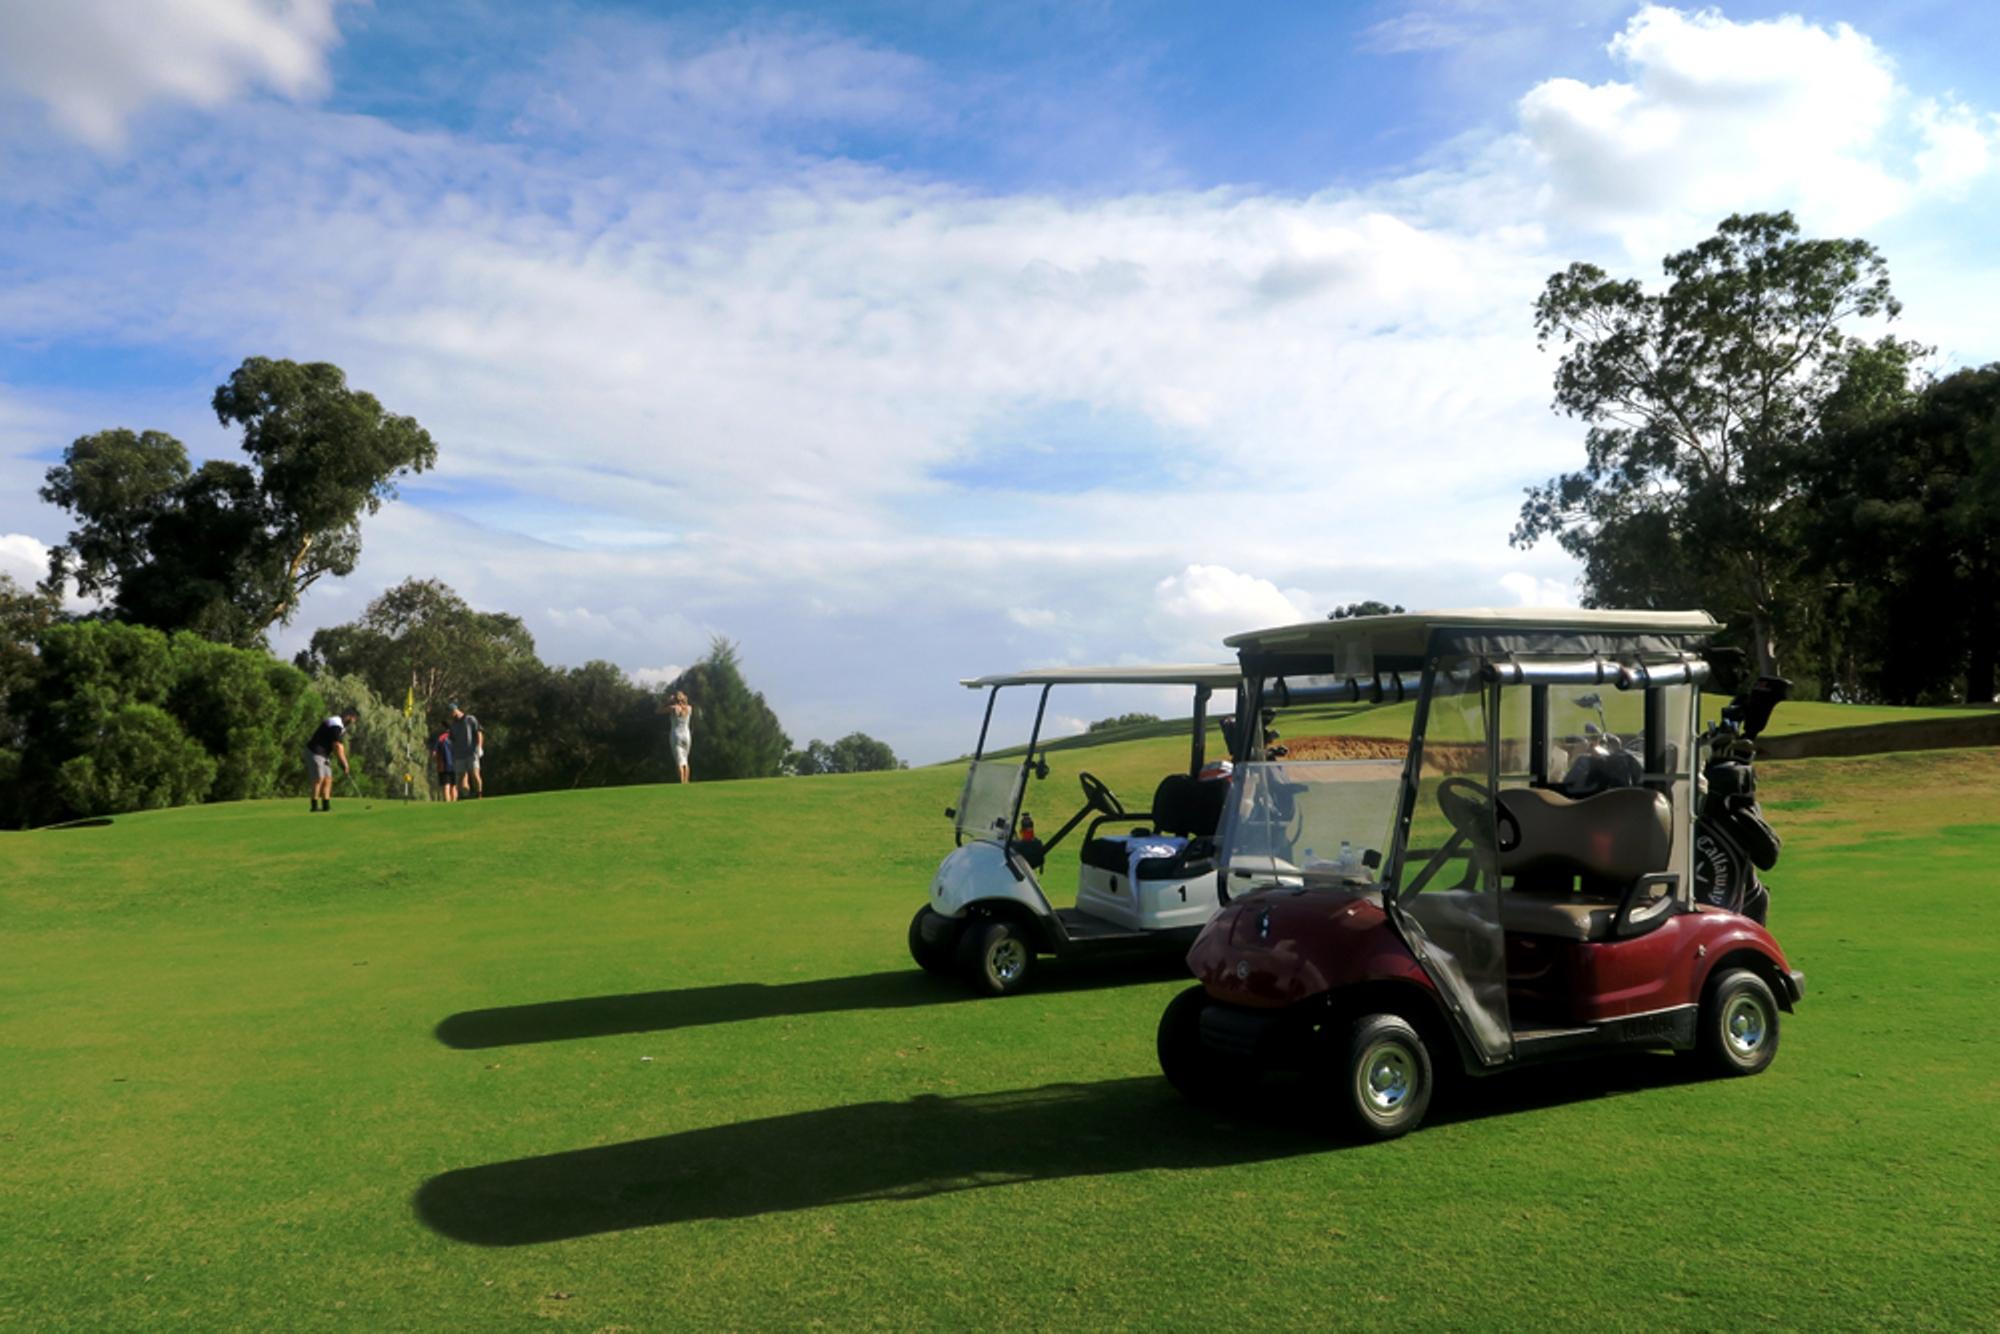 yarrawonga_golf_club_mulwala_resort.jpg